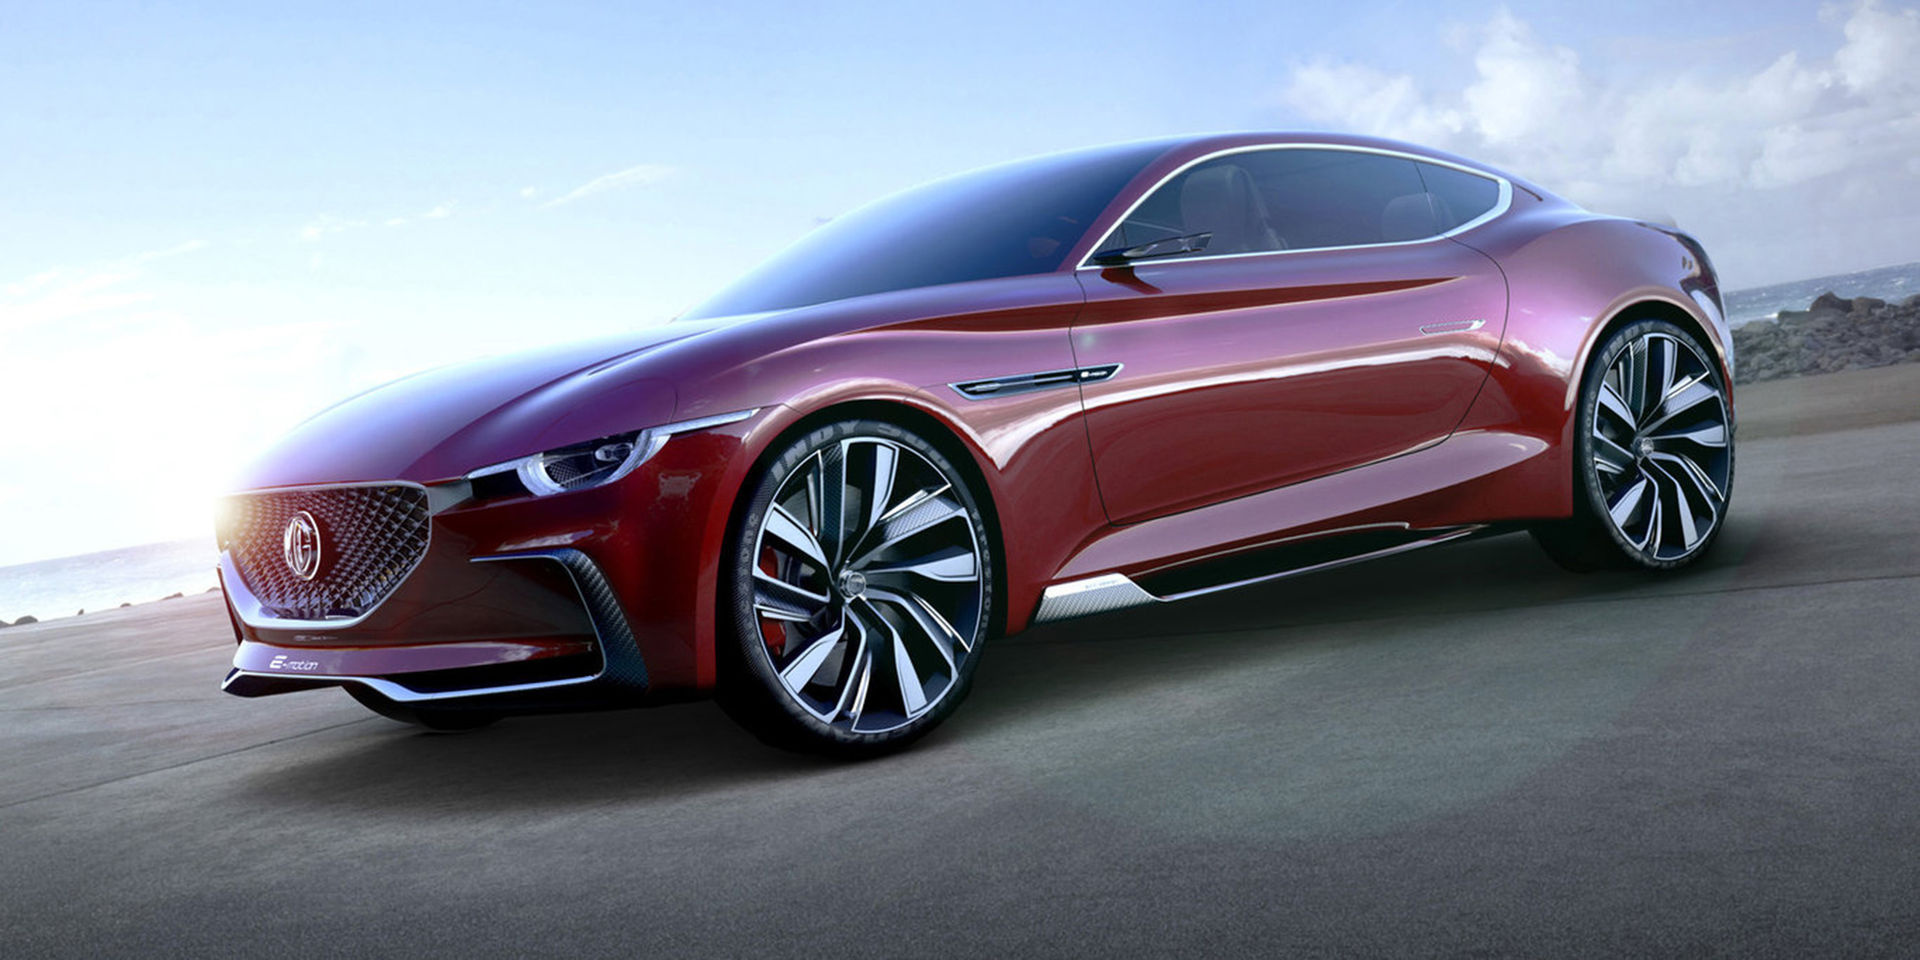 MG visar den eldrivna konceptbilen E-Motion